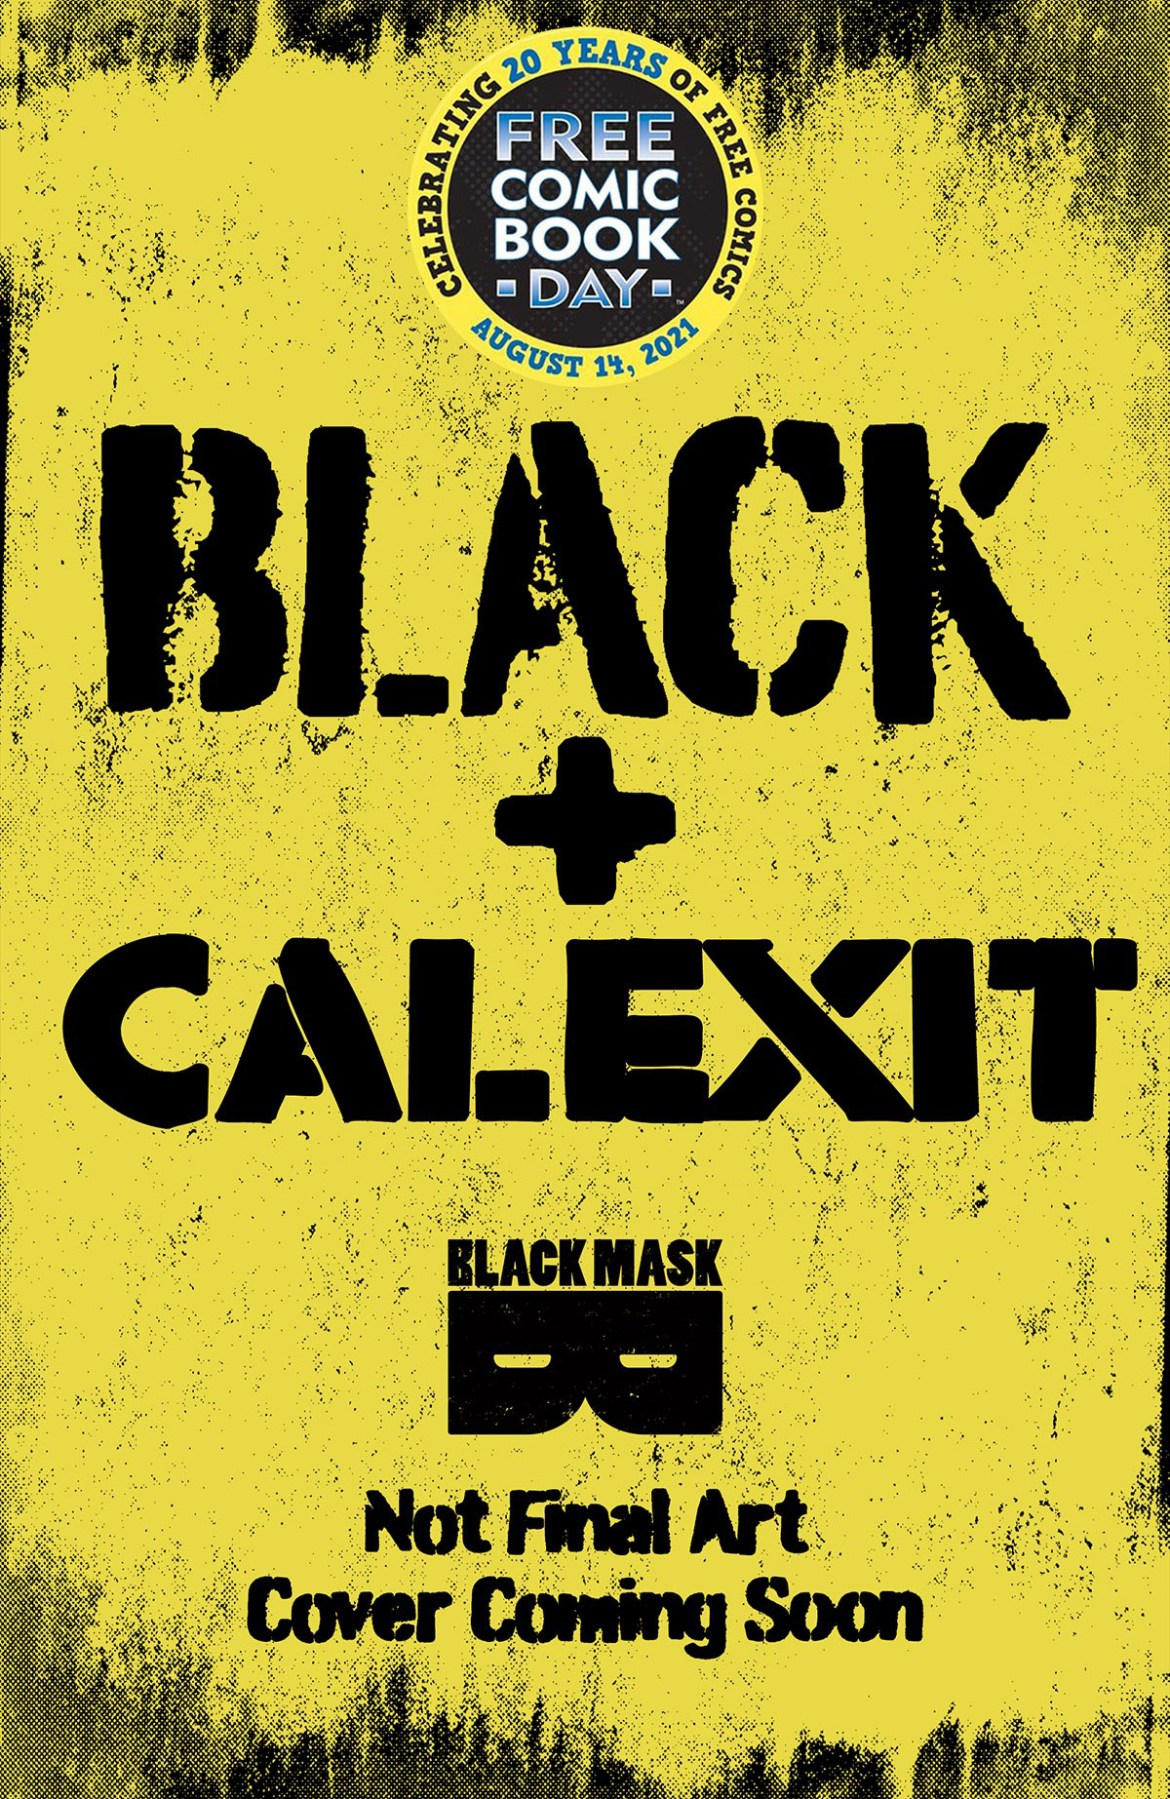 FCBD21_SILVER_Black-Mask_BLACK-CALEXIT- Complete Free Comic Book Day 2021 comic book line-up announced